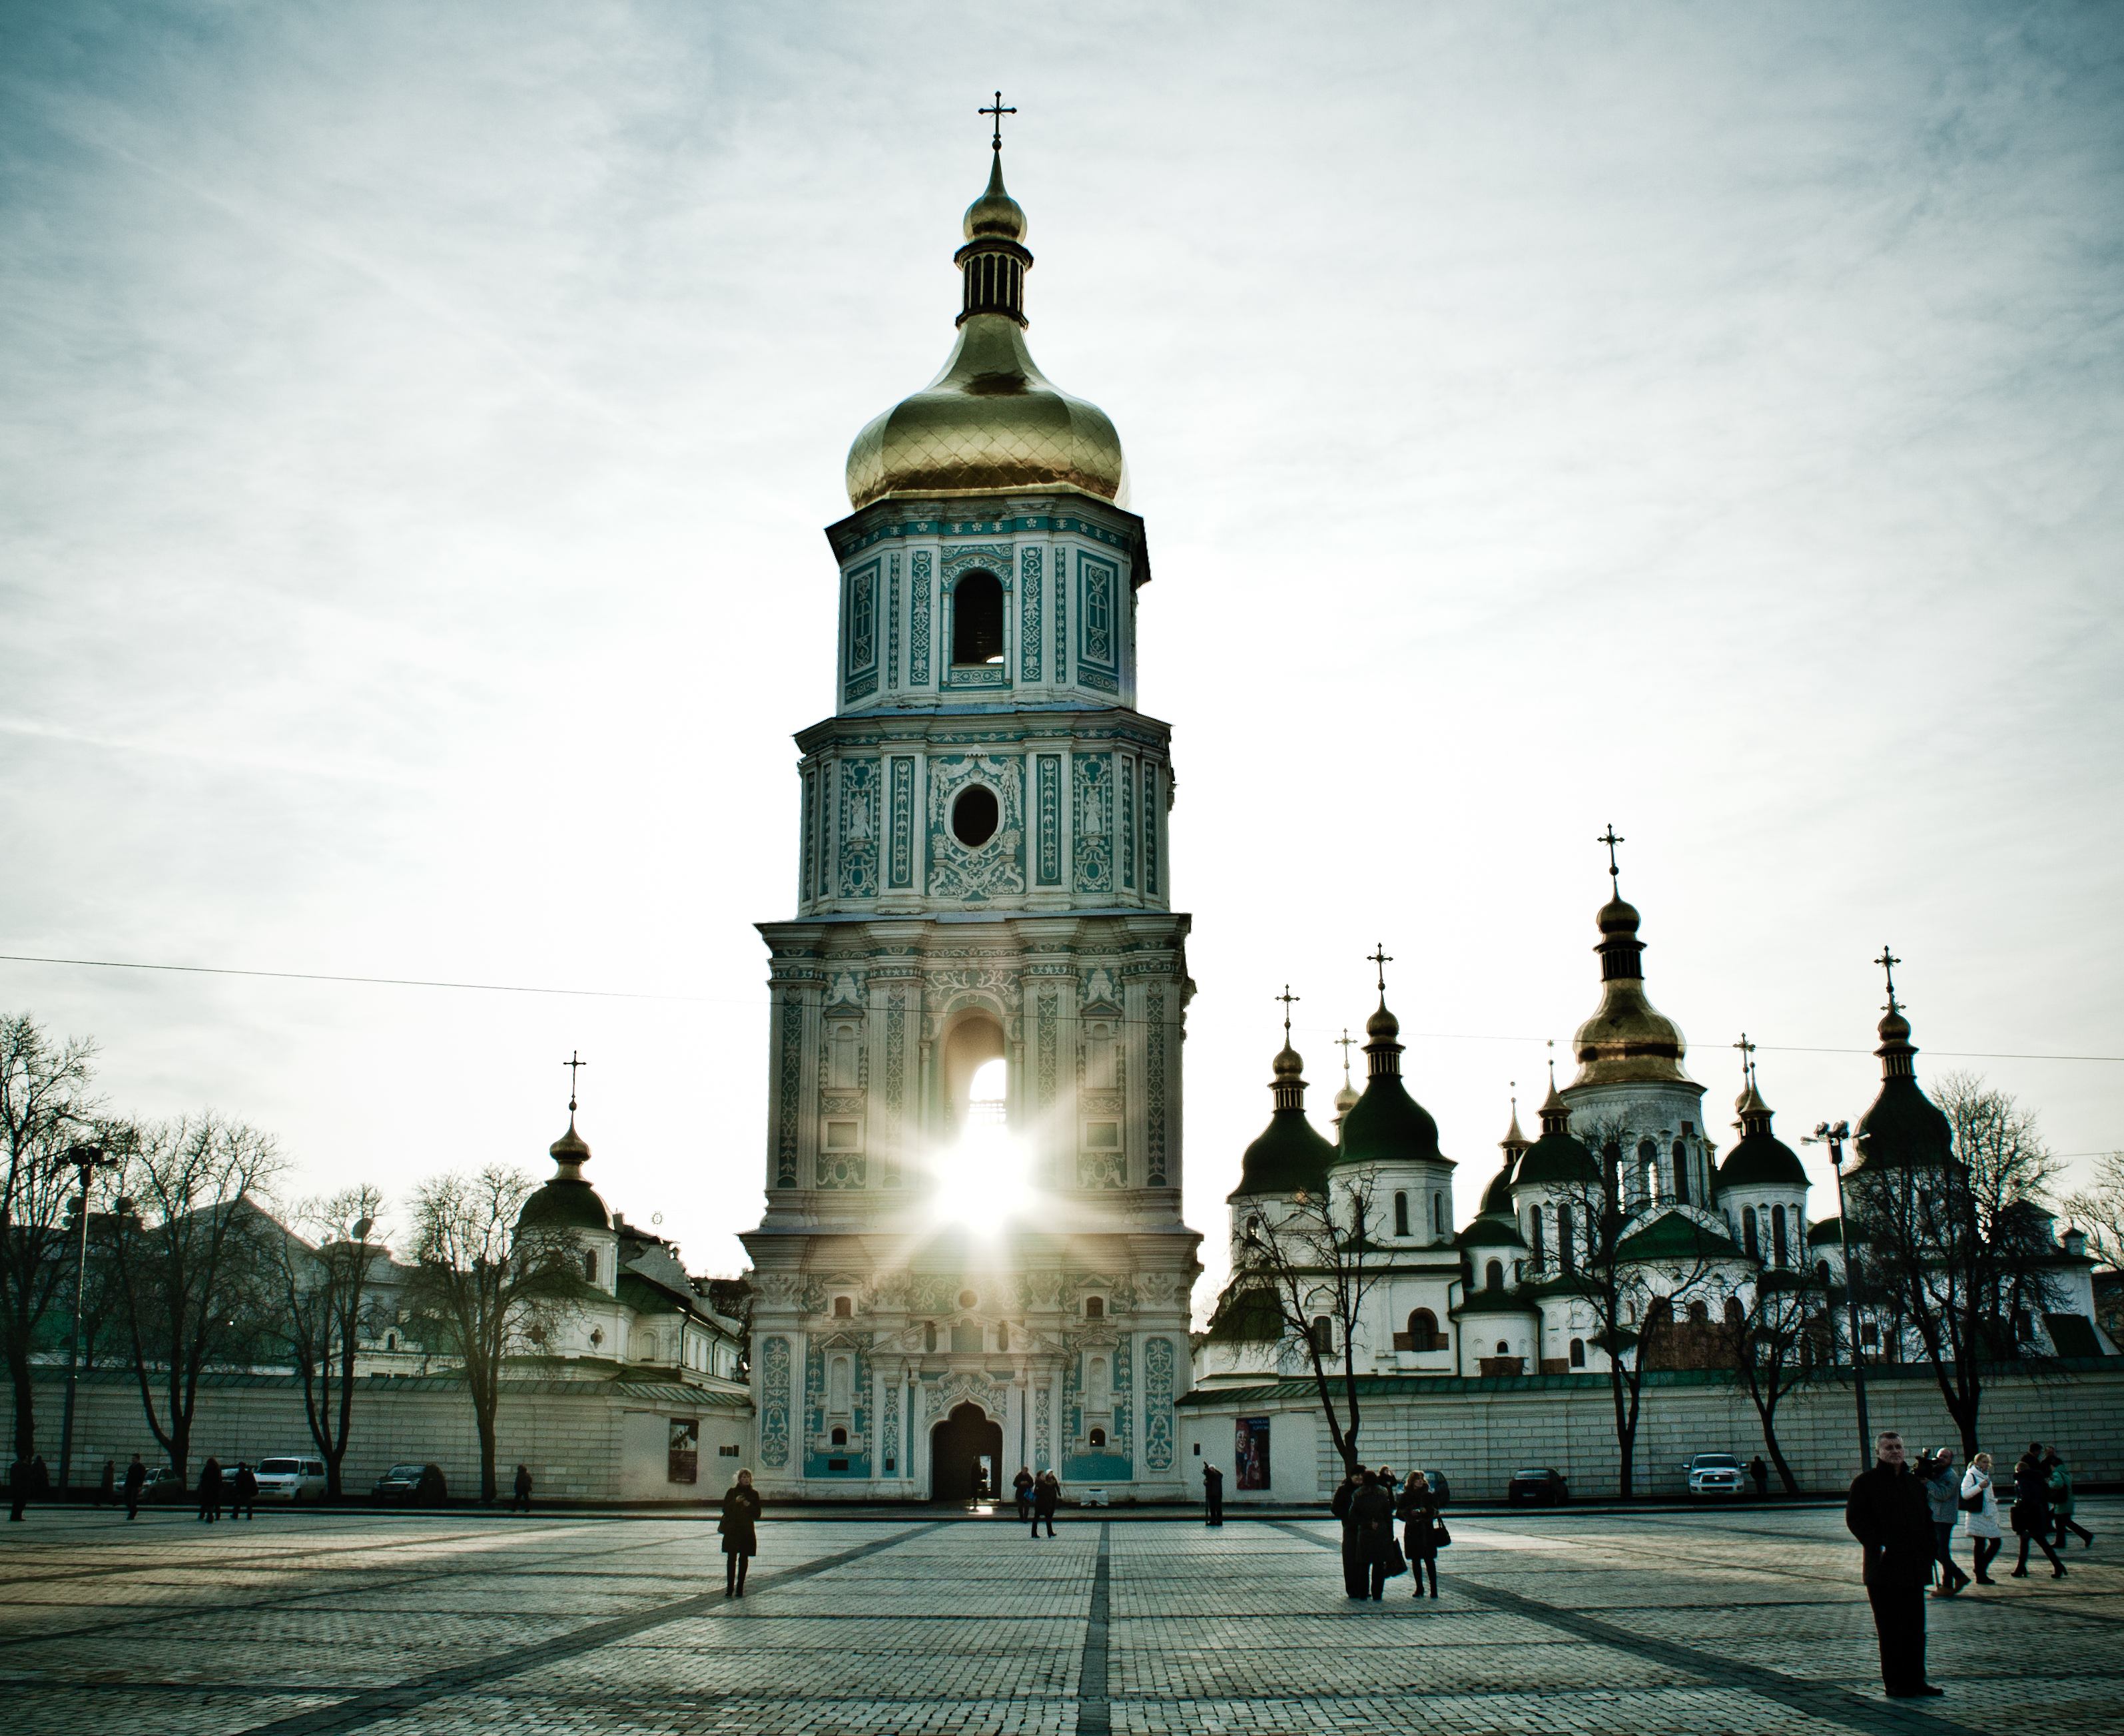 фото борисенкова